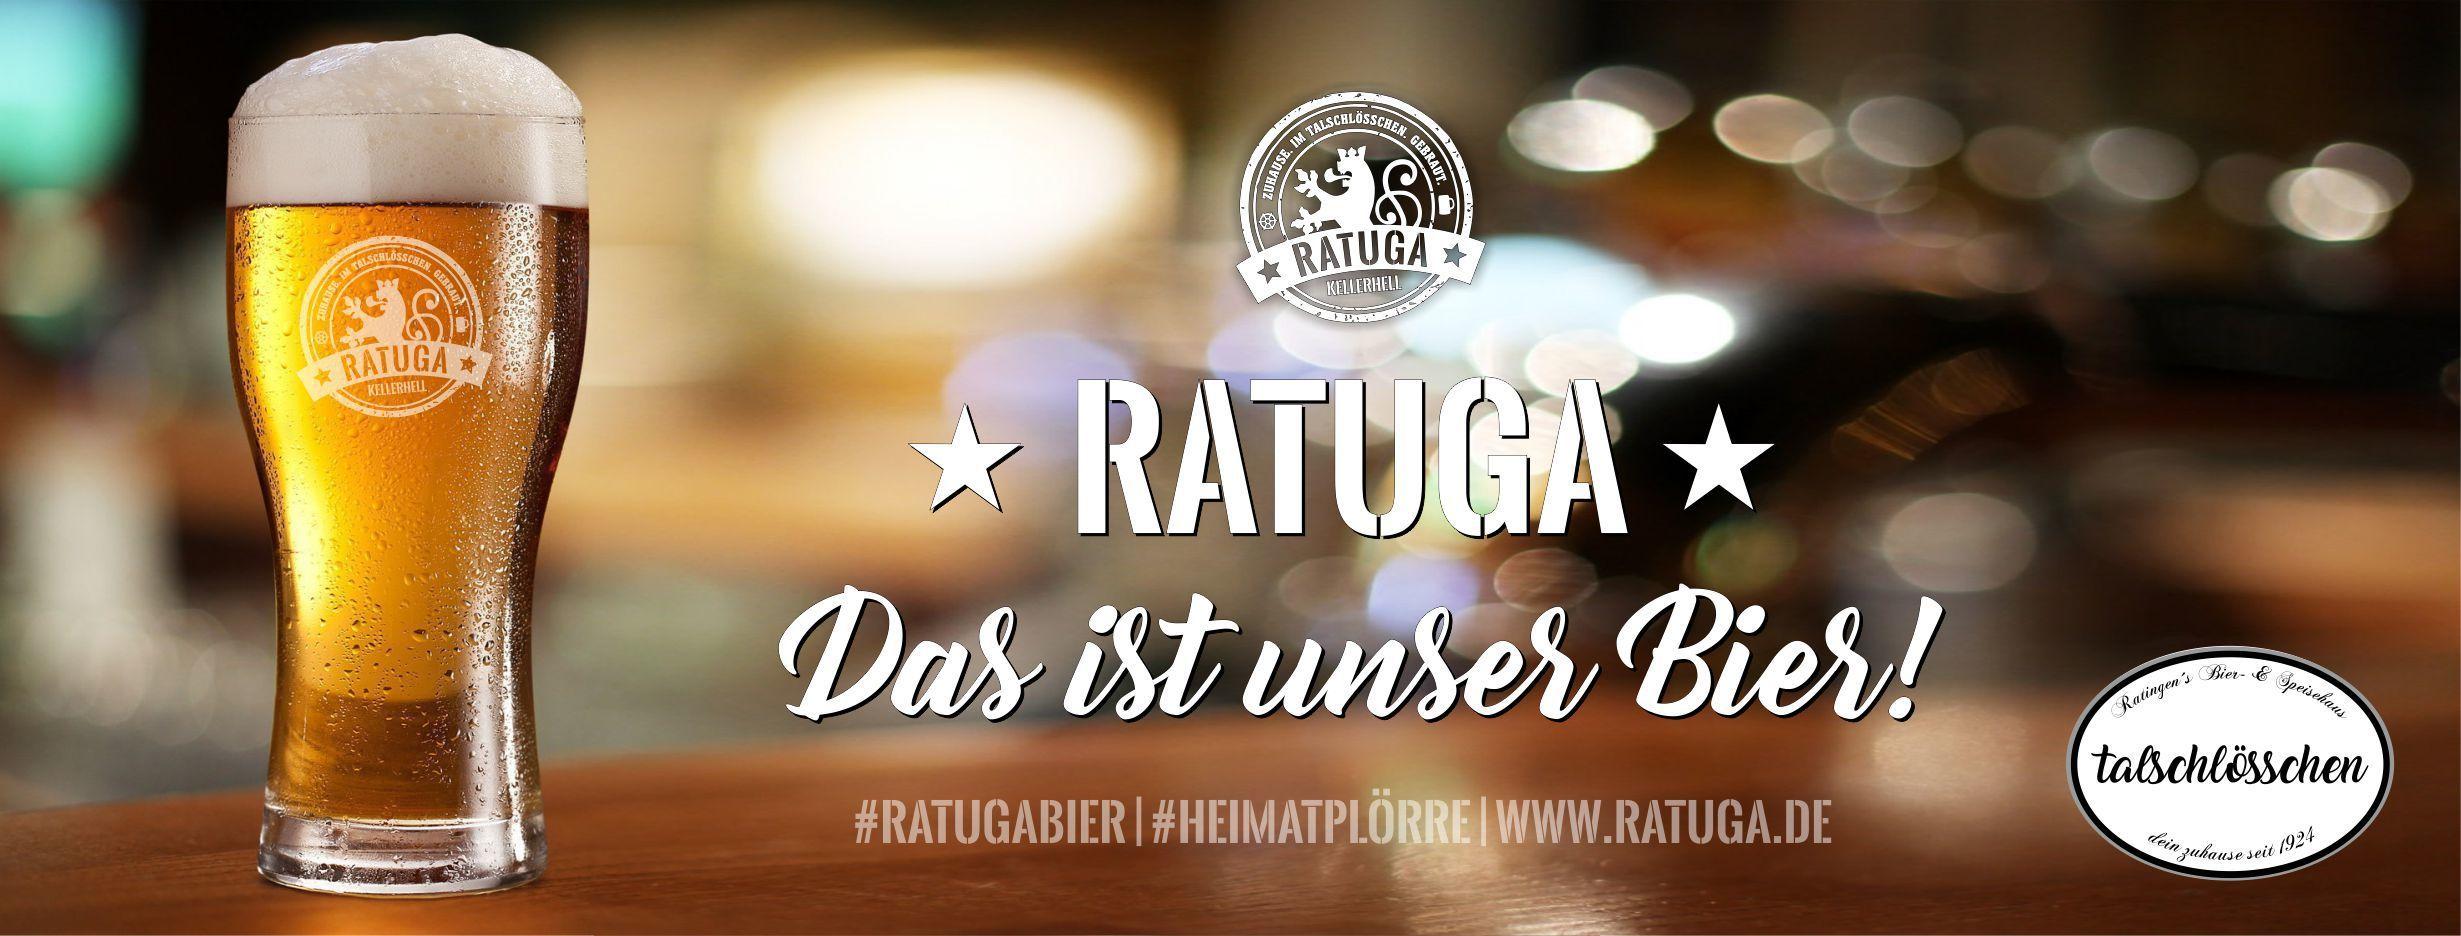 RATUGA - das ist unser Bier! - RATUGA Bier